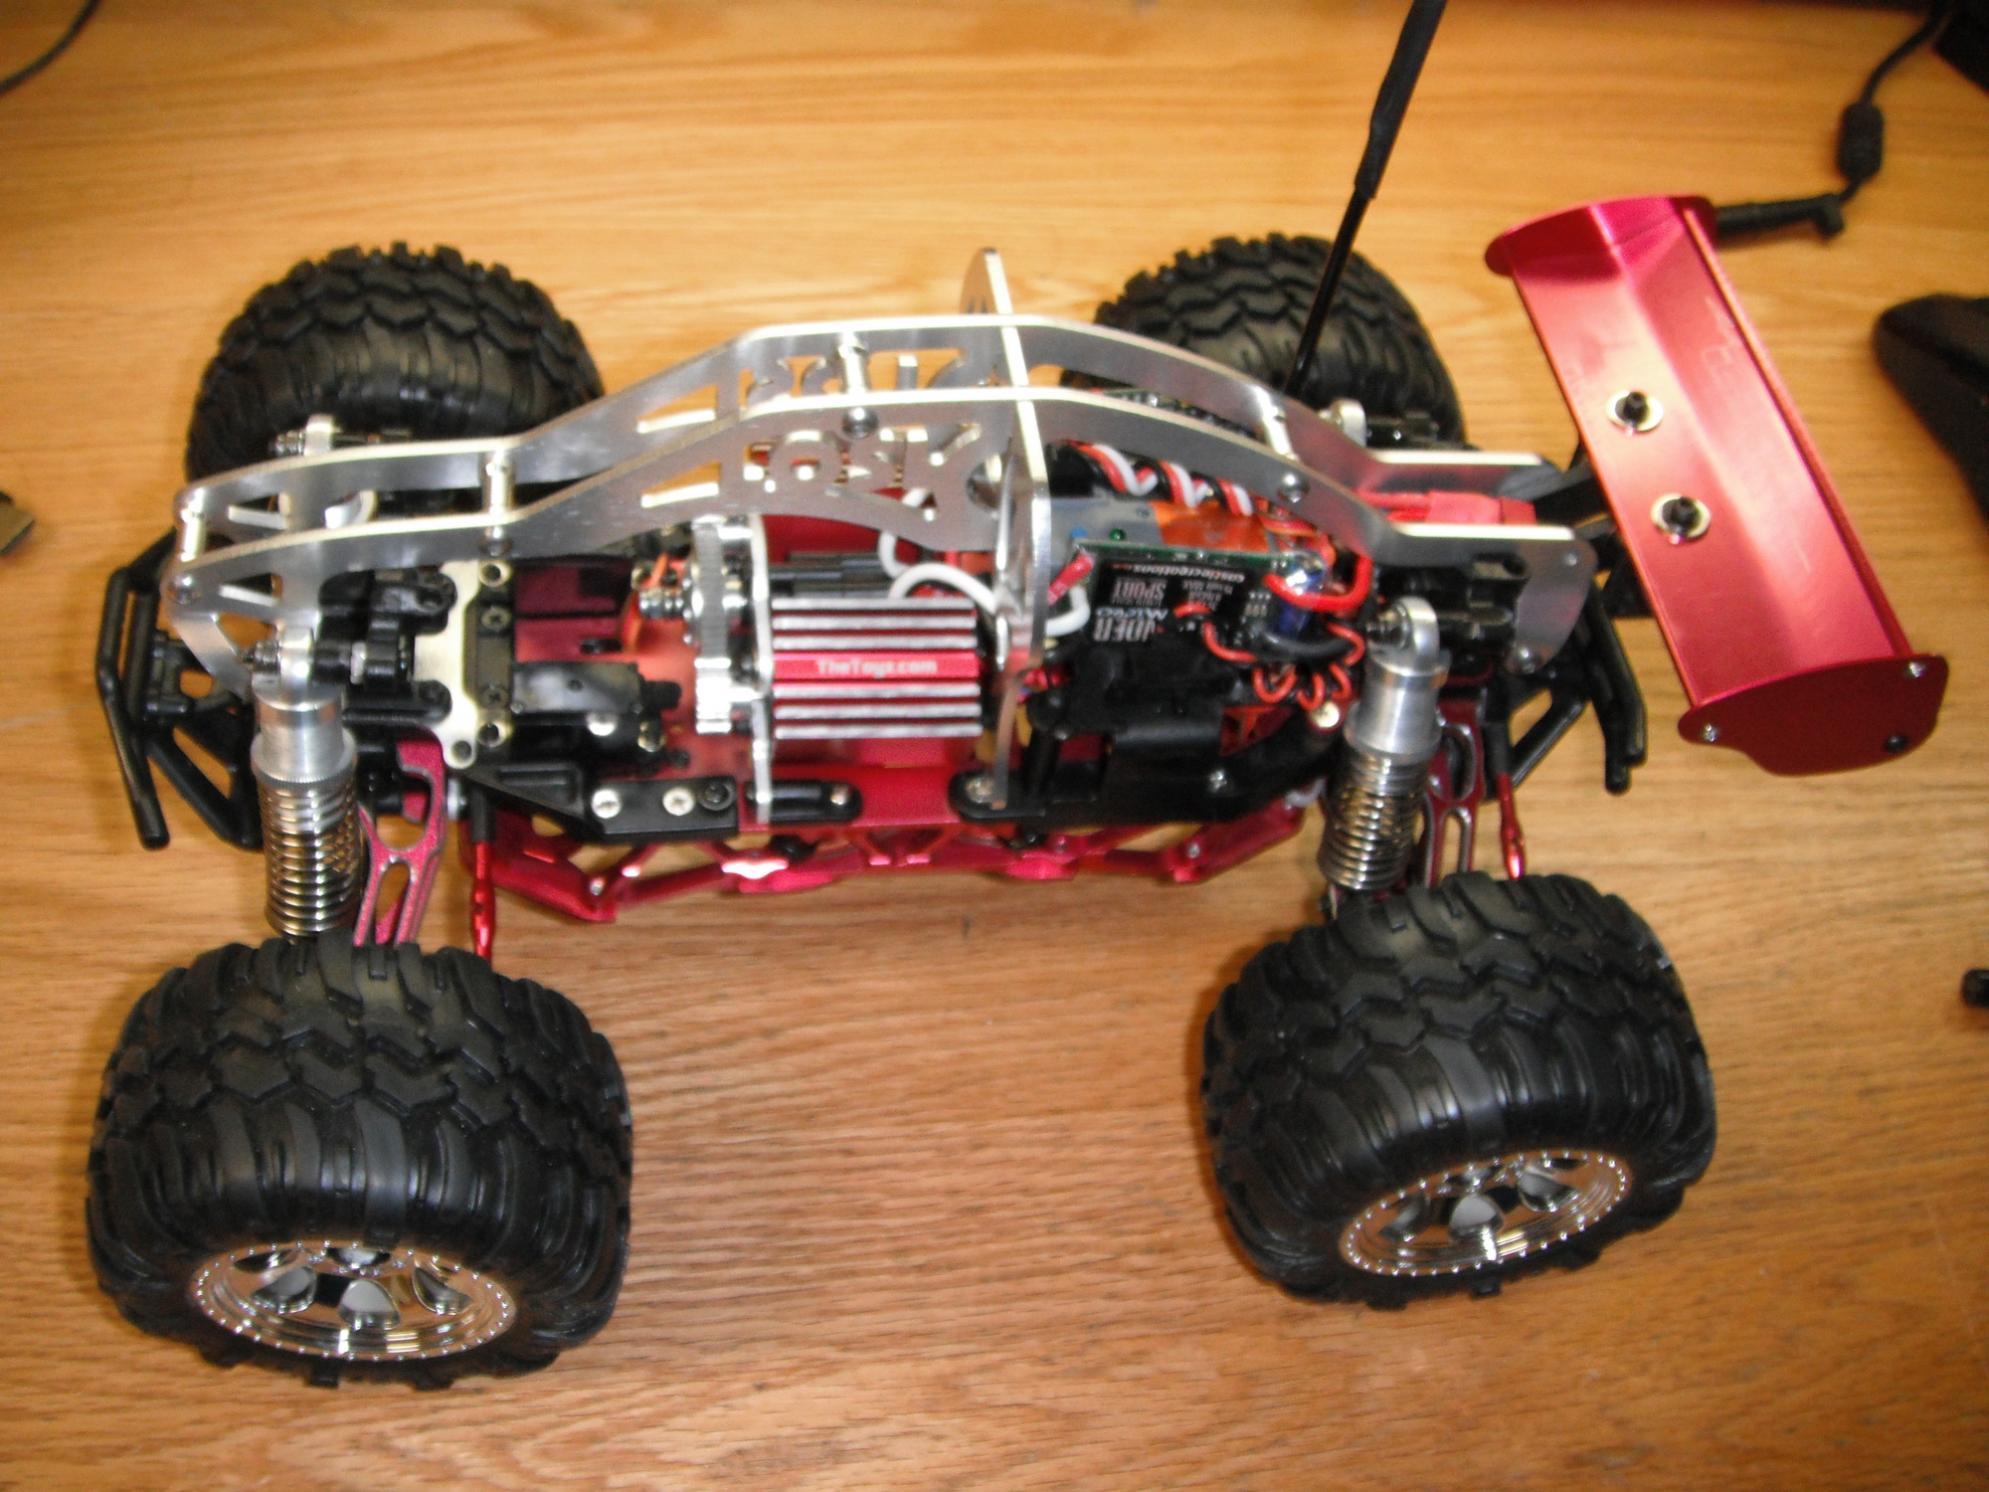 Dual Brushless Mini Lst Red Alluminum dscf2191